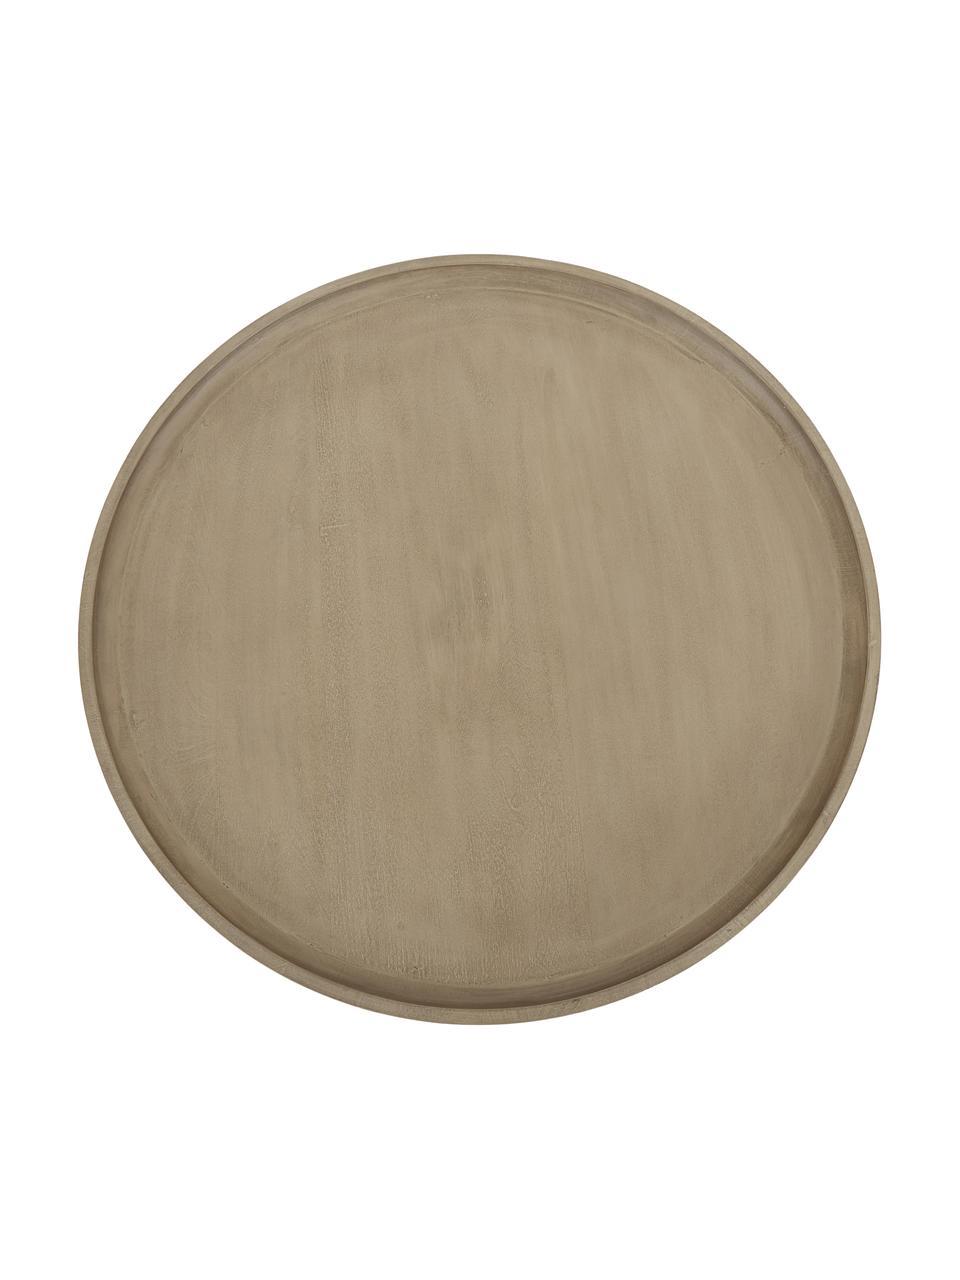 Couchtisch Benno aus Mangoholz, Massives Mangoholz, lackiert, Grau, Ø 80 x H 35 cm